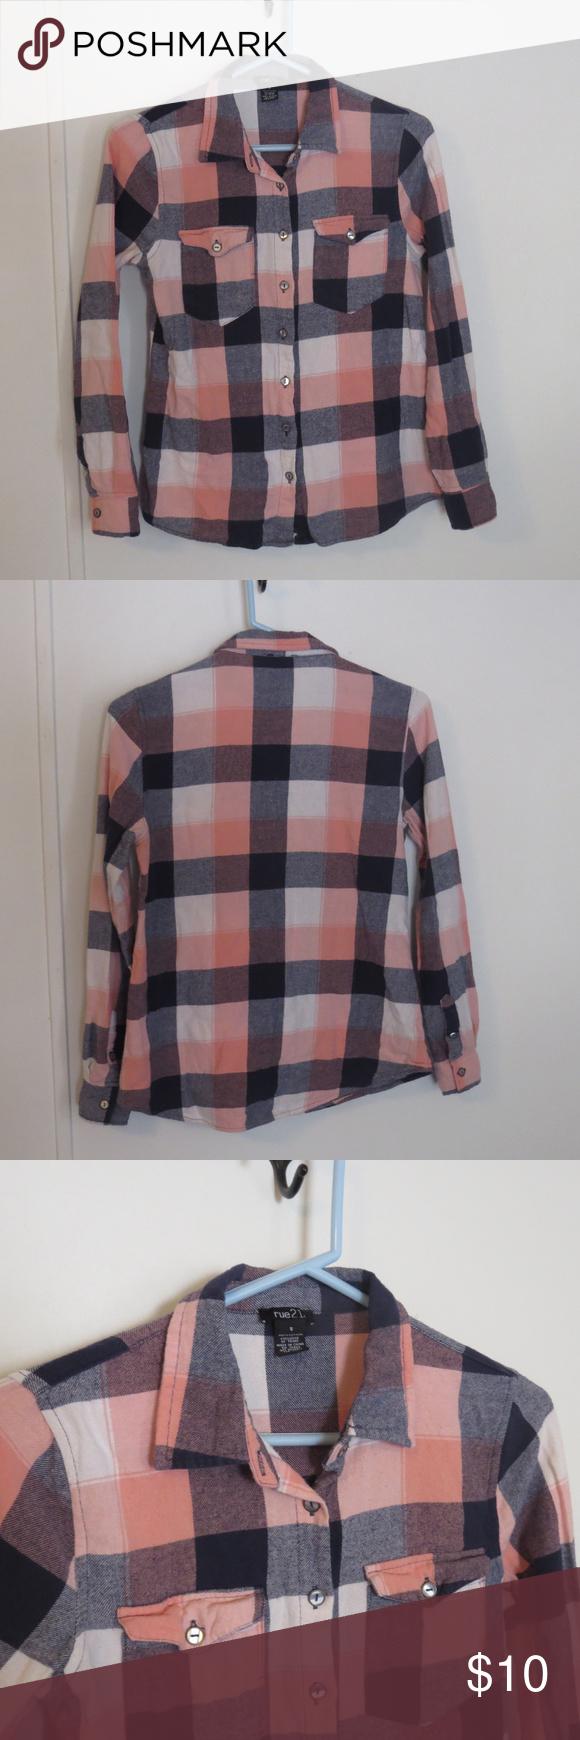 Orange flannel jacket  rue Small Pink u Gray Plaid Flannel Shirt Button  Plaid flannel